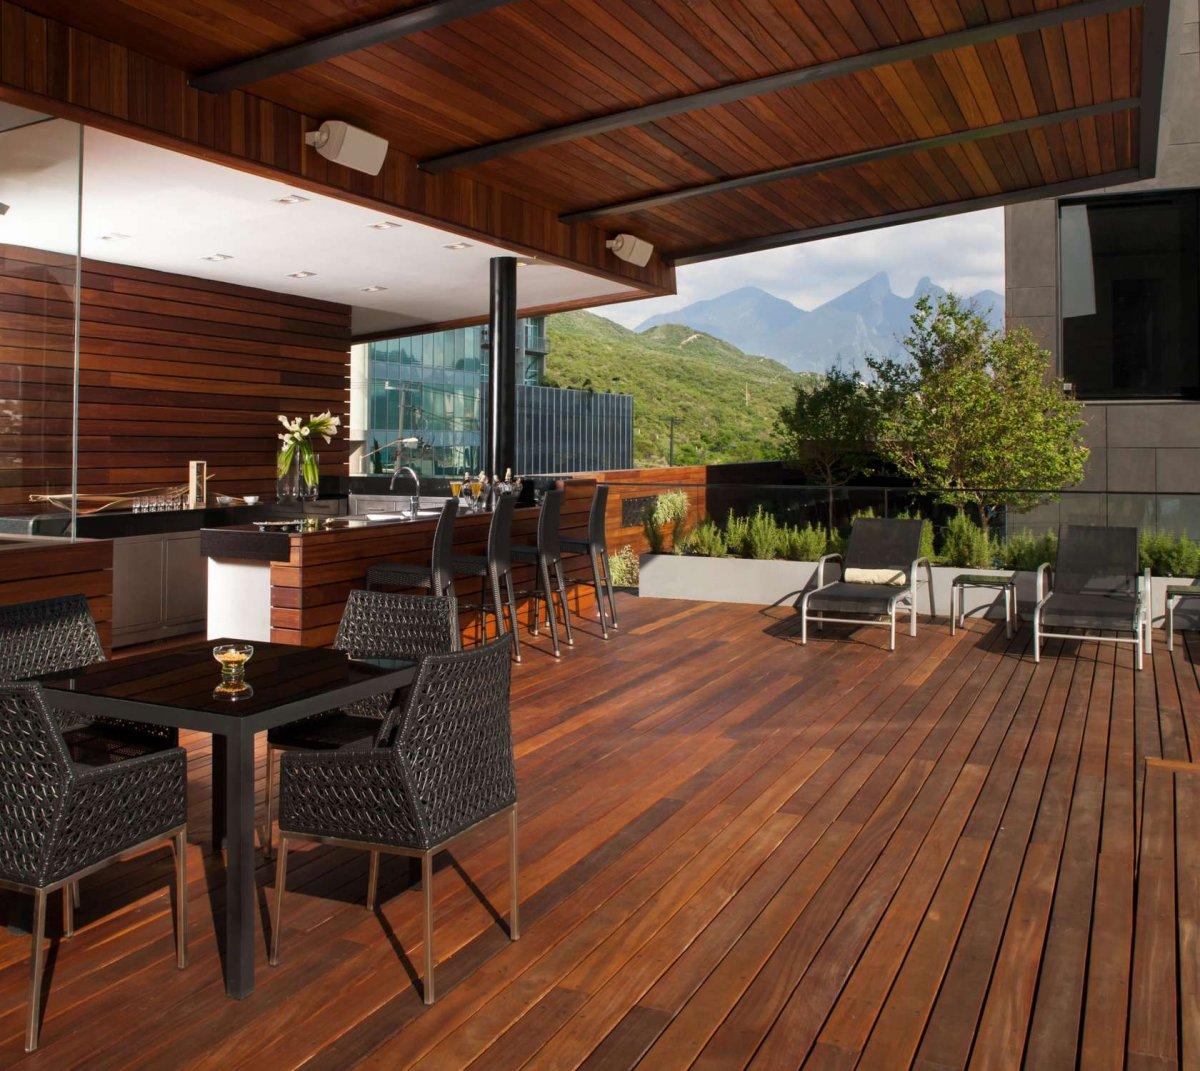 New House Interior Ideas